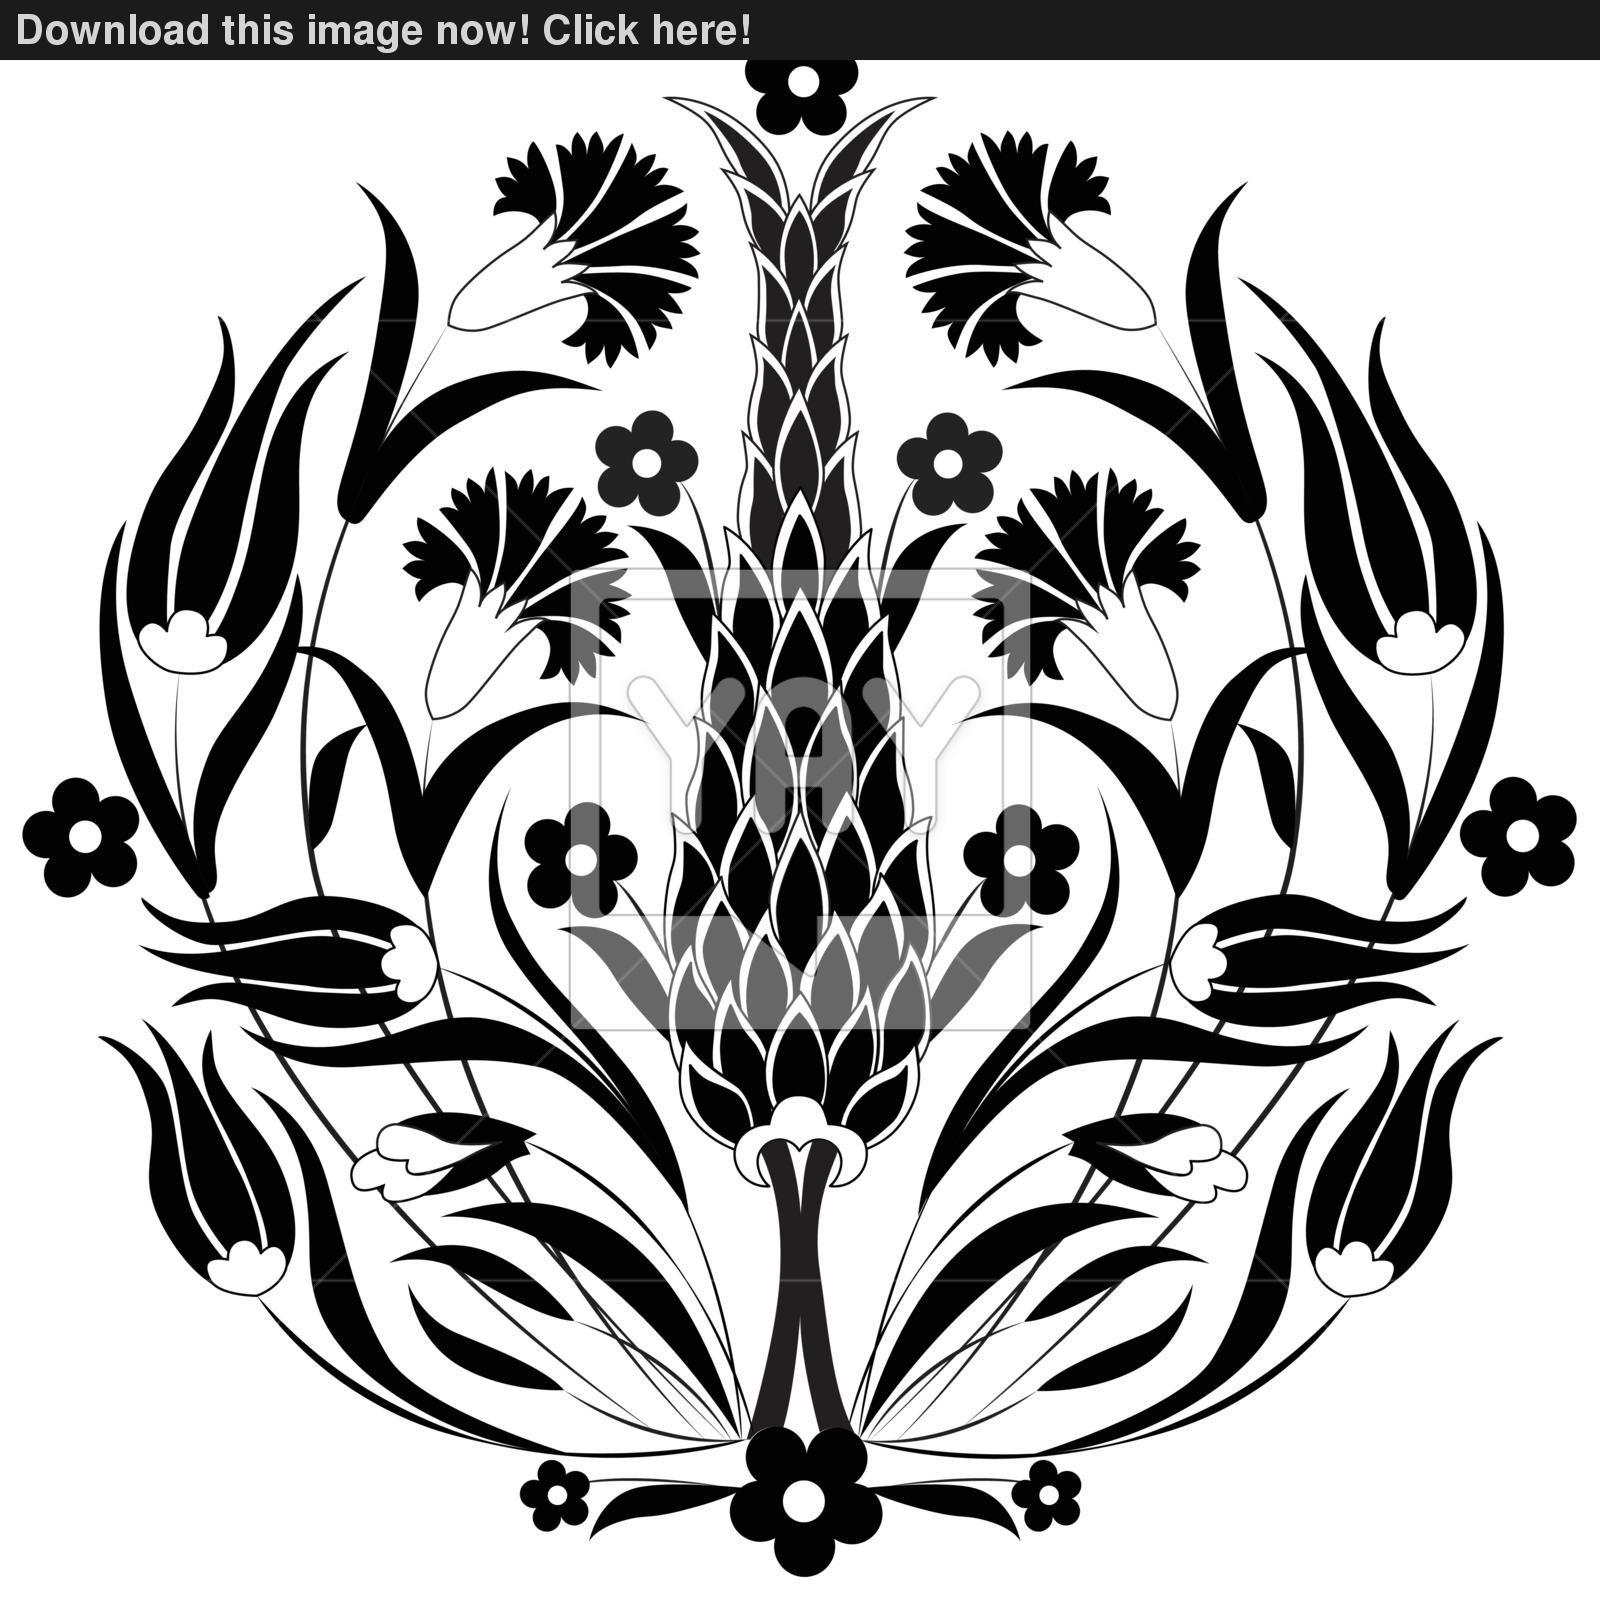 oriental-ottoman-design-black-91454978.jpg 1.600×1.600 piksel